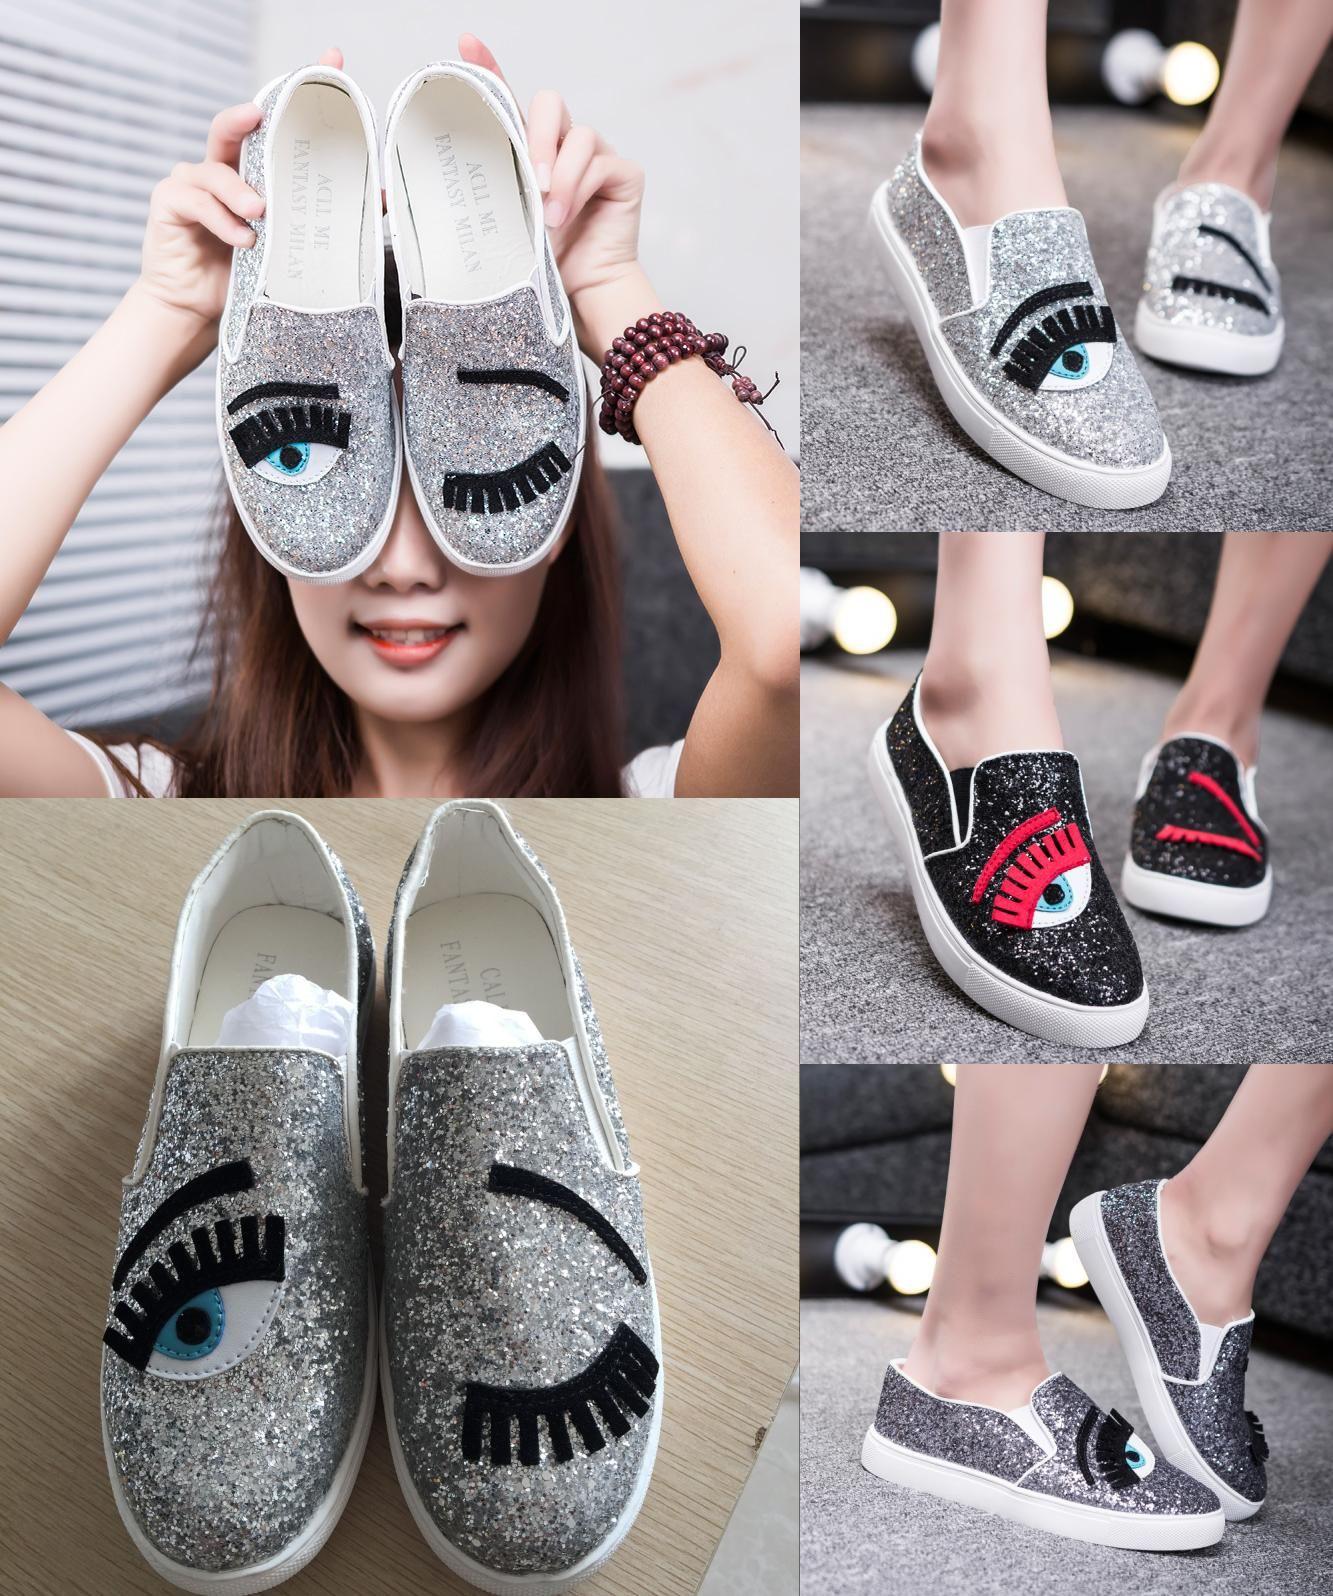 [Visit to Buy] 2016 Chiara Ferragni Flats Round Toe Zapatos Mujer Glitter  Eyelash Flat